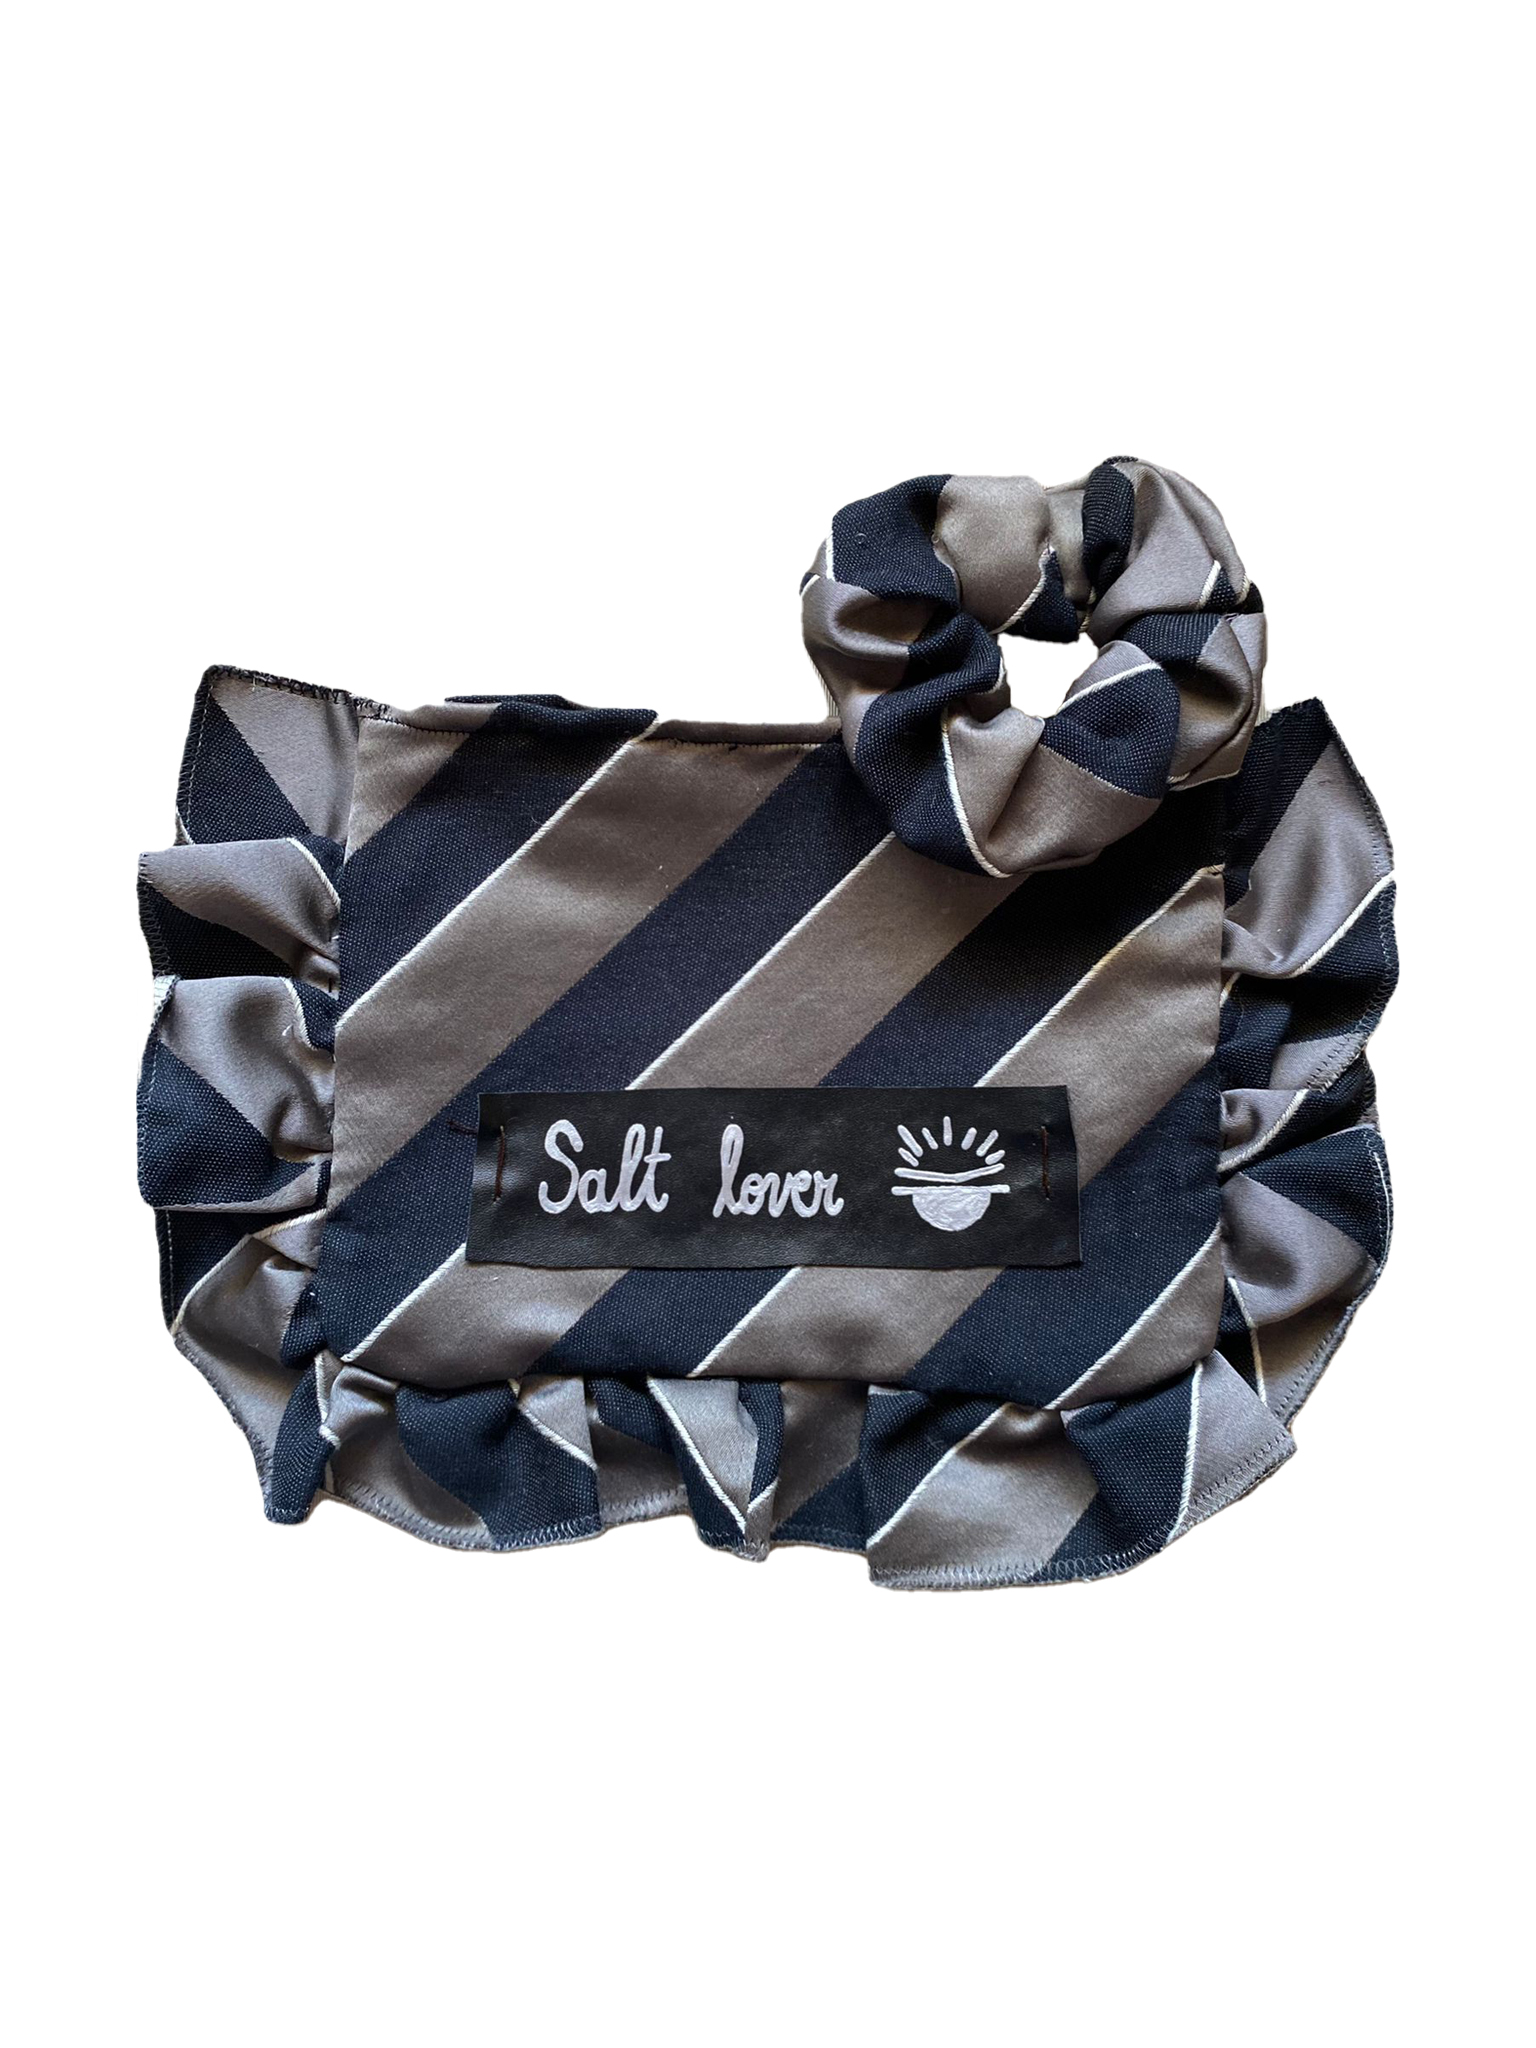 Pochette Media e Scrunchie – Salt Lover Stripes